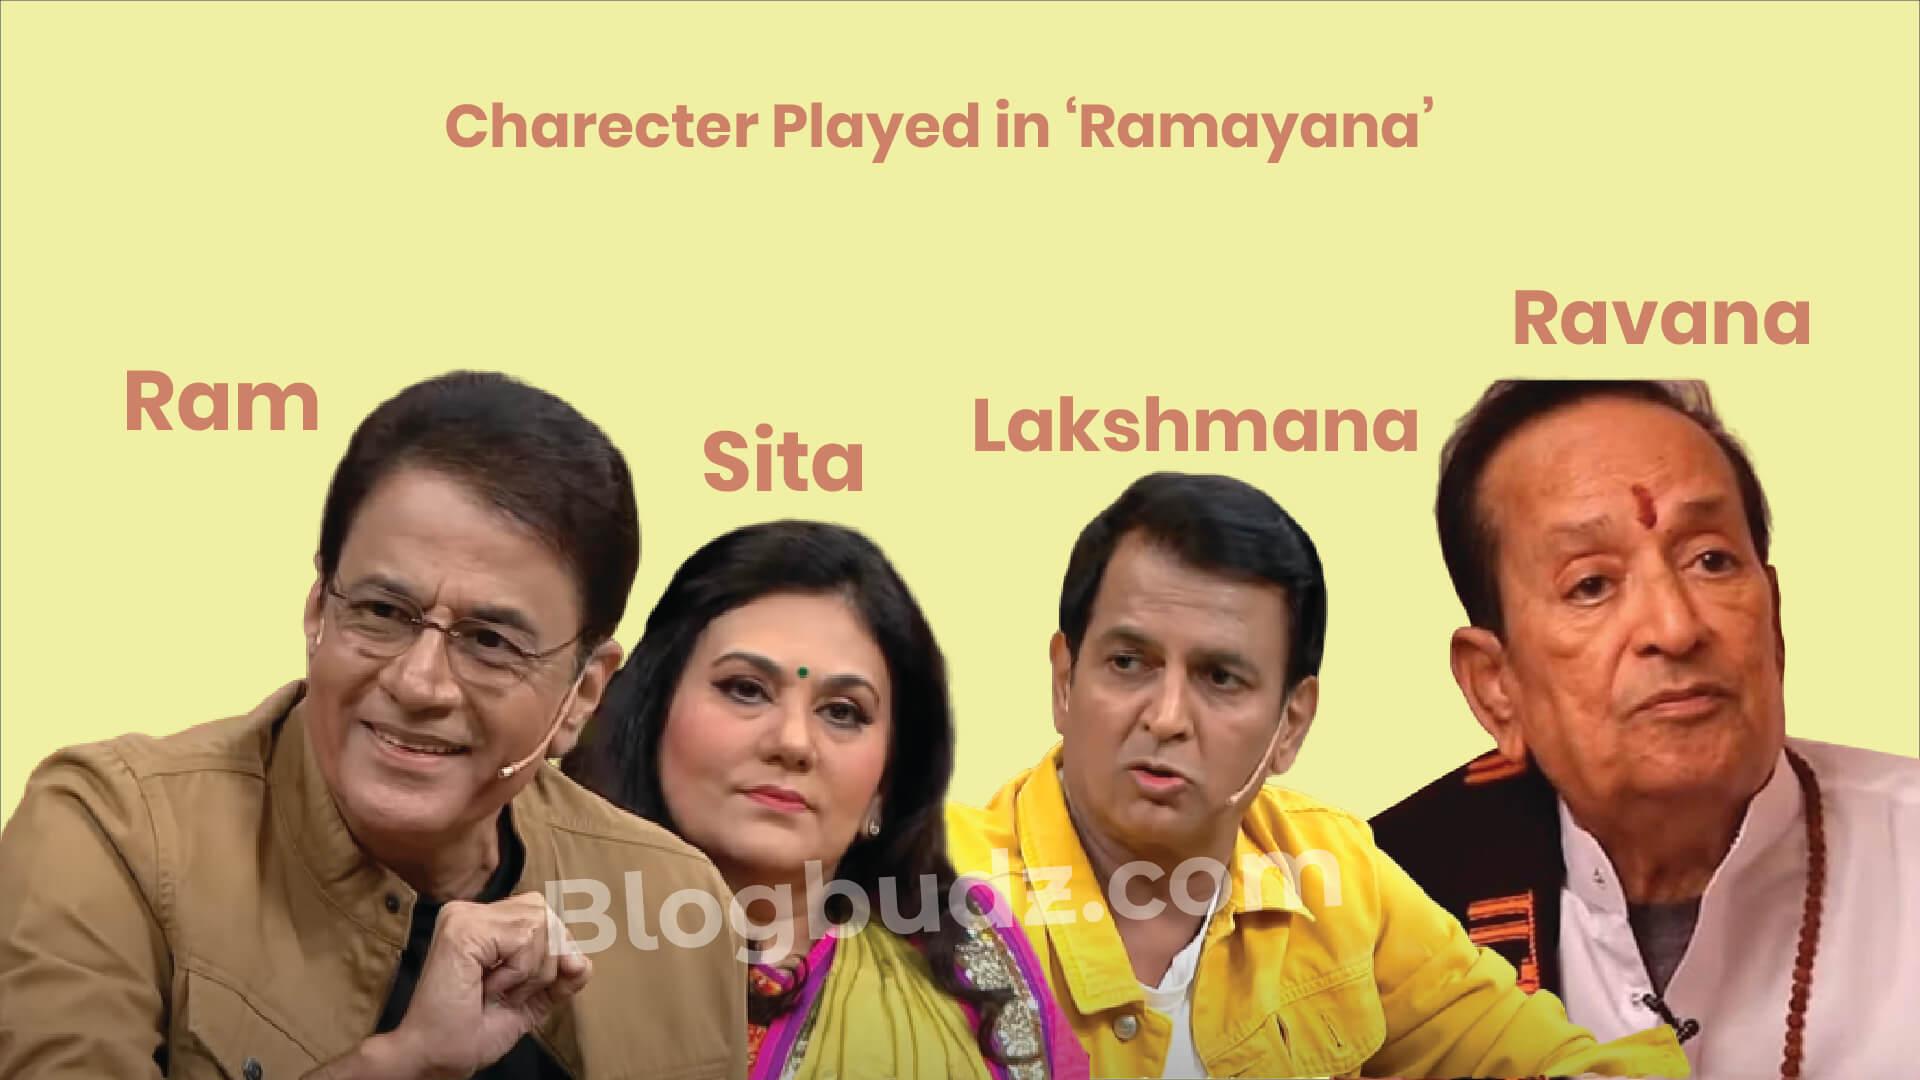 Ramayana Character